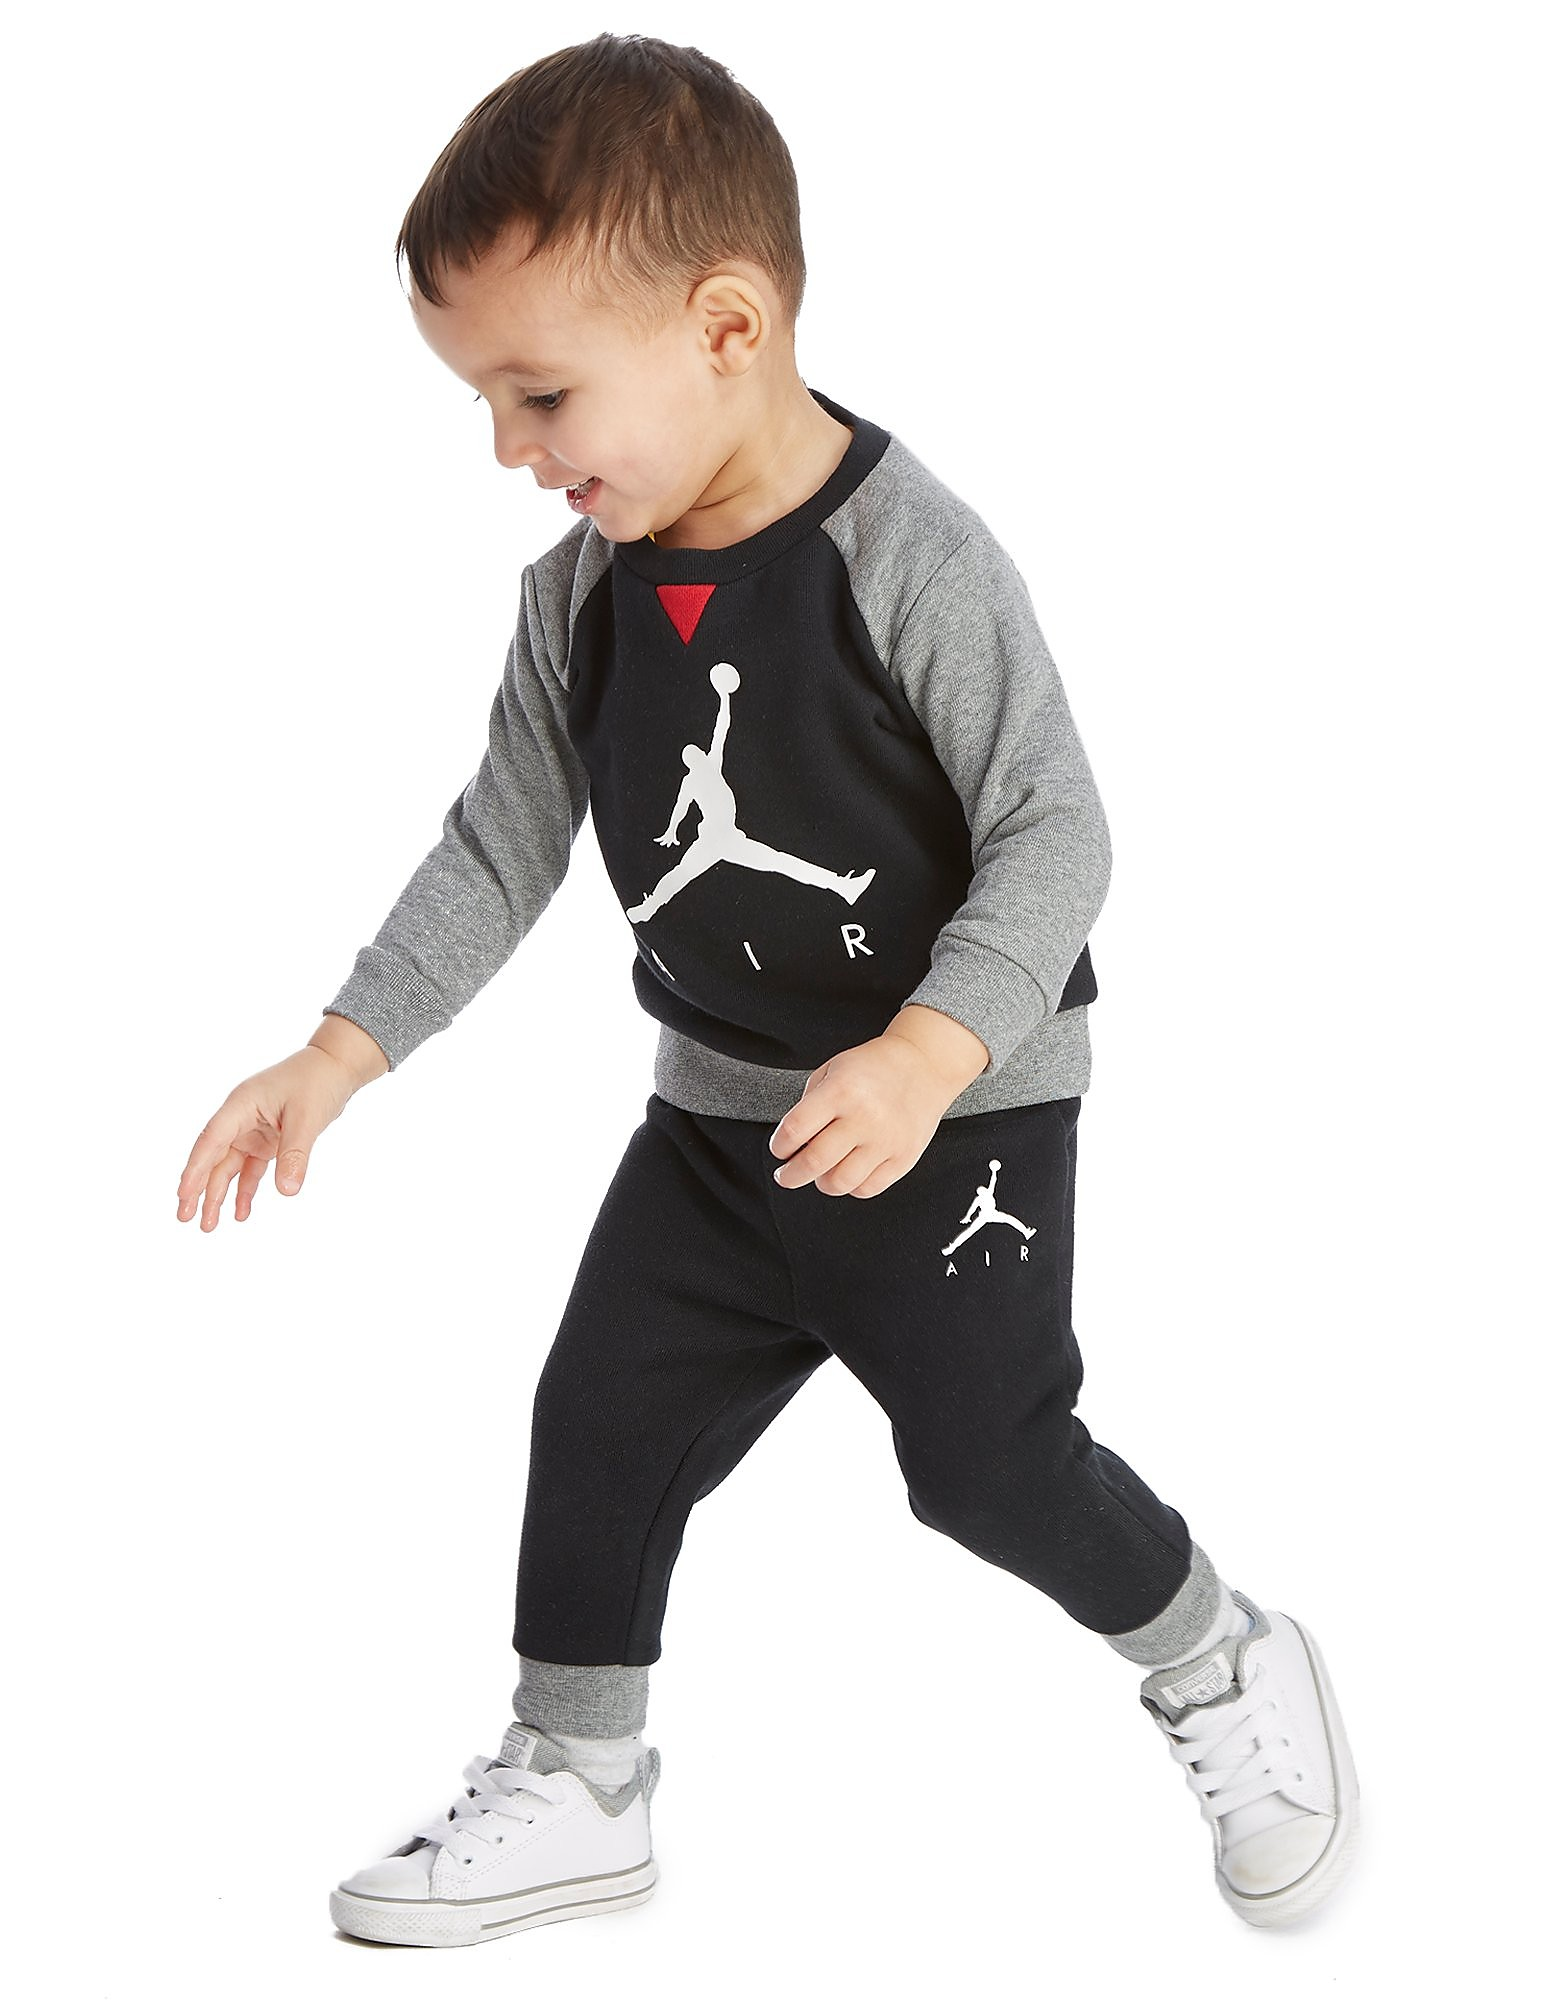 Jordan Franchise Crew Tracksuit Infant